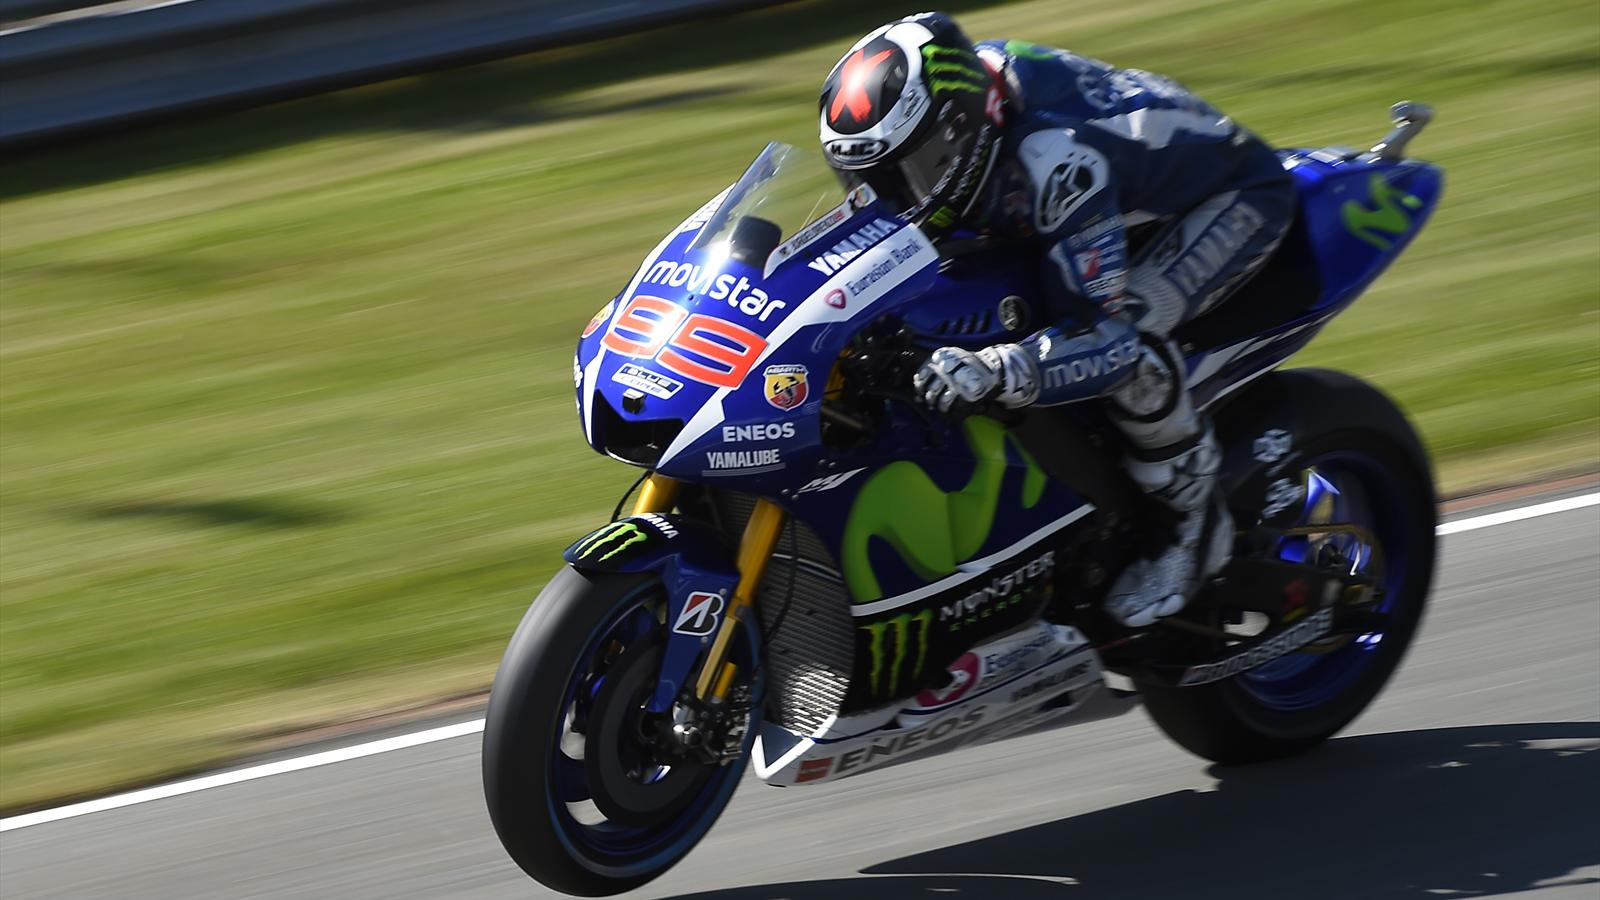 Jorge Lorenzo (Yamaha Factory) - GP of Germany 2015